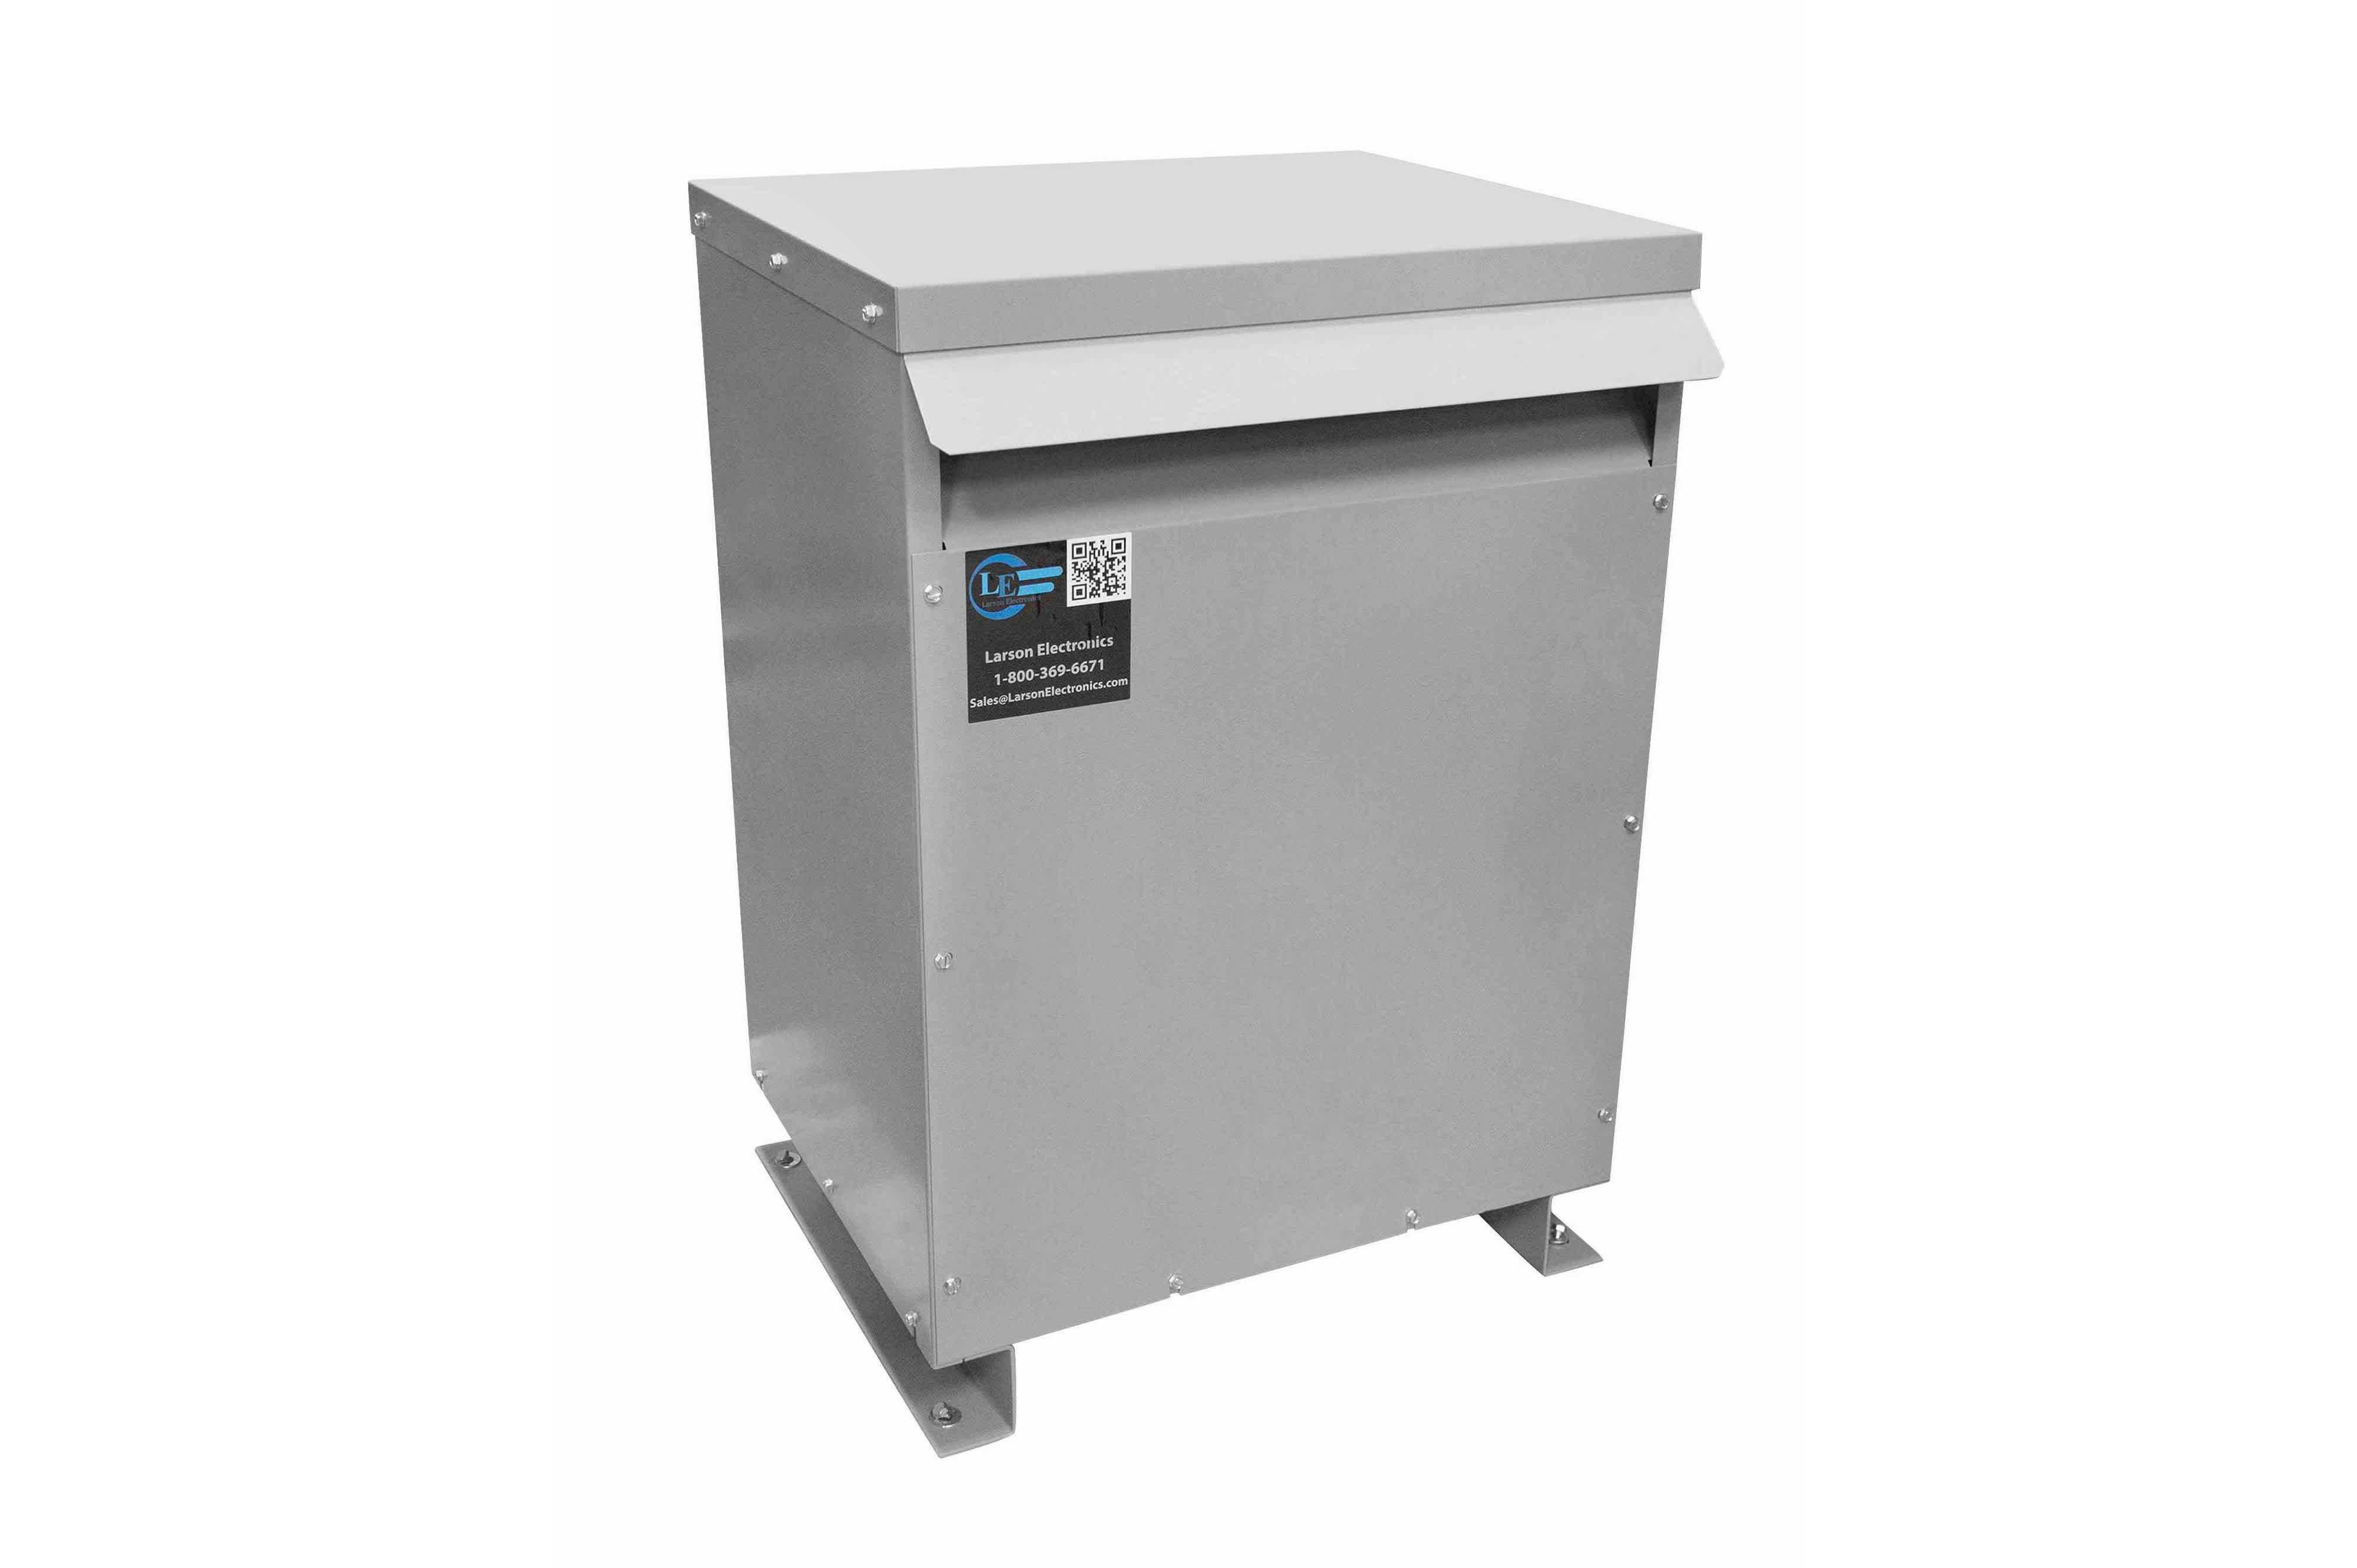 29 kVA 3PH Isolation Transformer, 400V Wye Primary, 208Y/120 Wye-N Secondary, N3R, Ventilated, 60 Hz